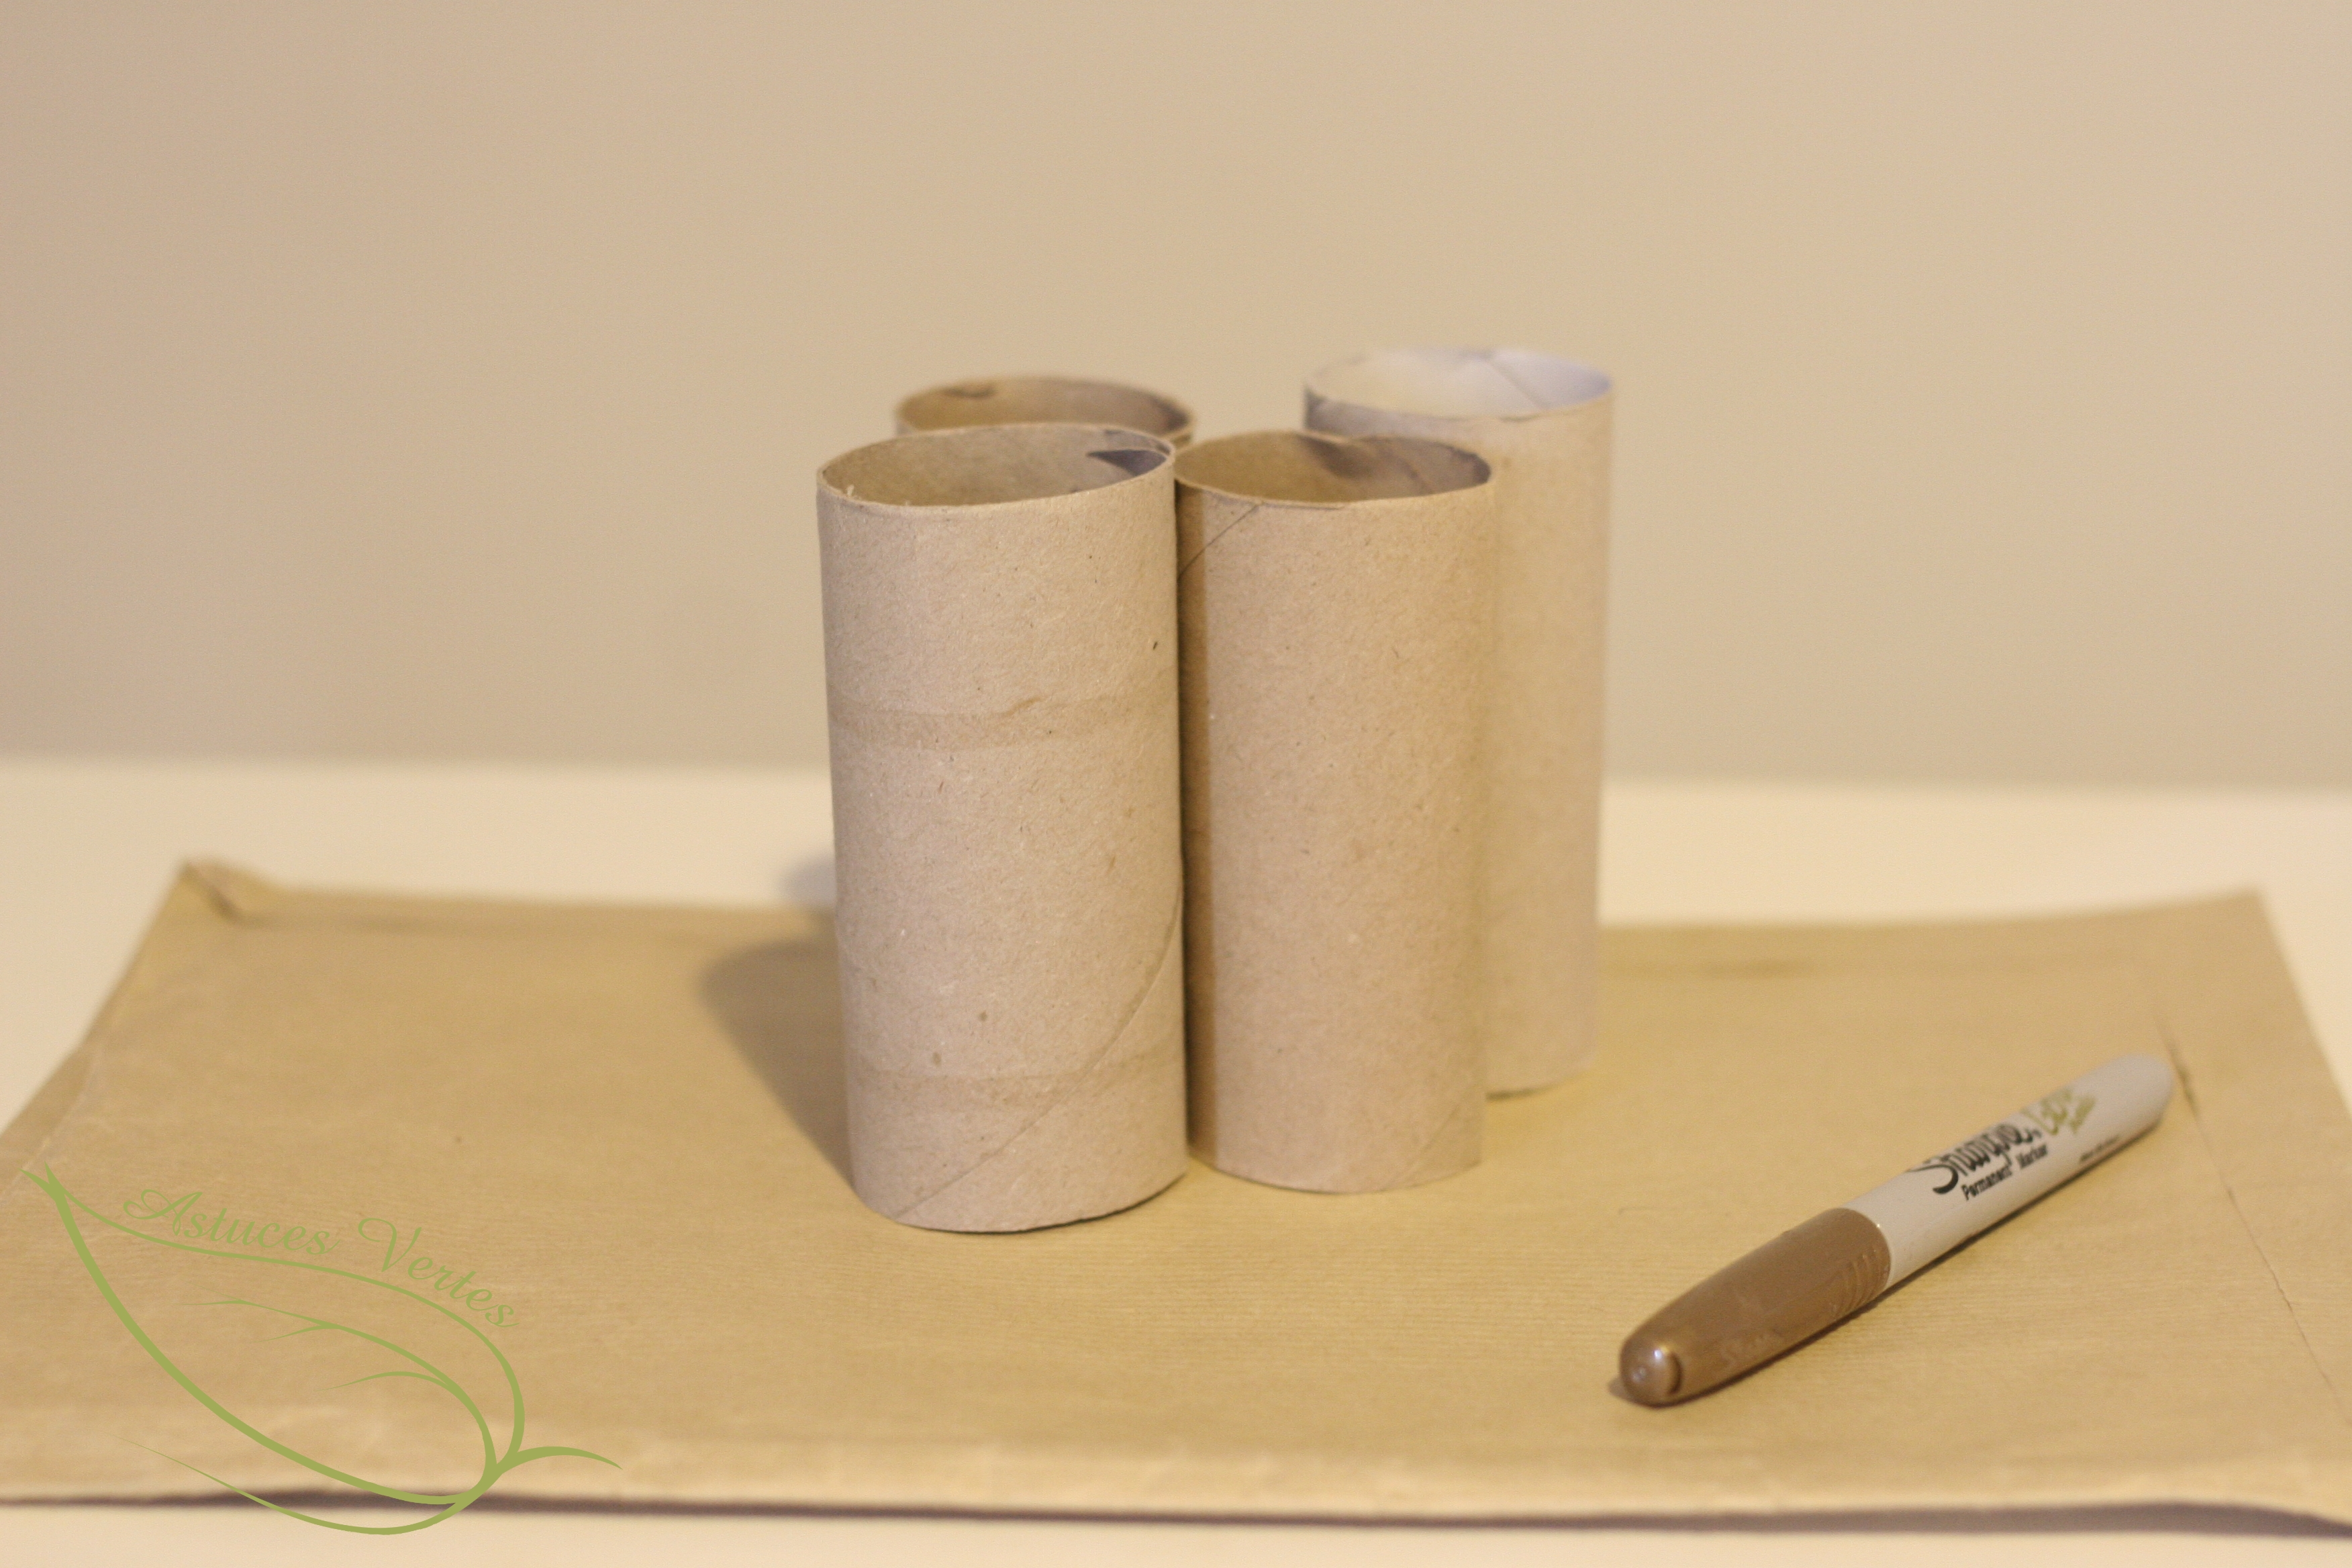 Fabriquer un calendrier de l avent 100 r cup les - Calendrier de l avent papier toilette ...